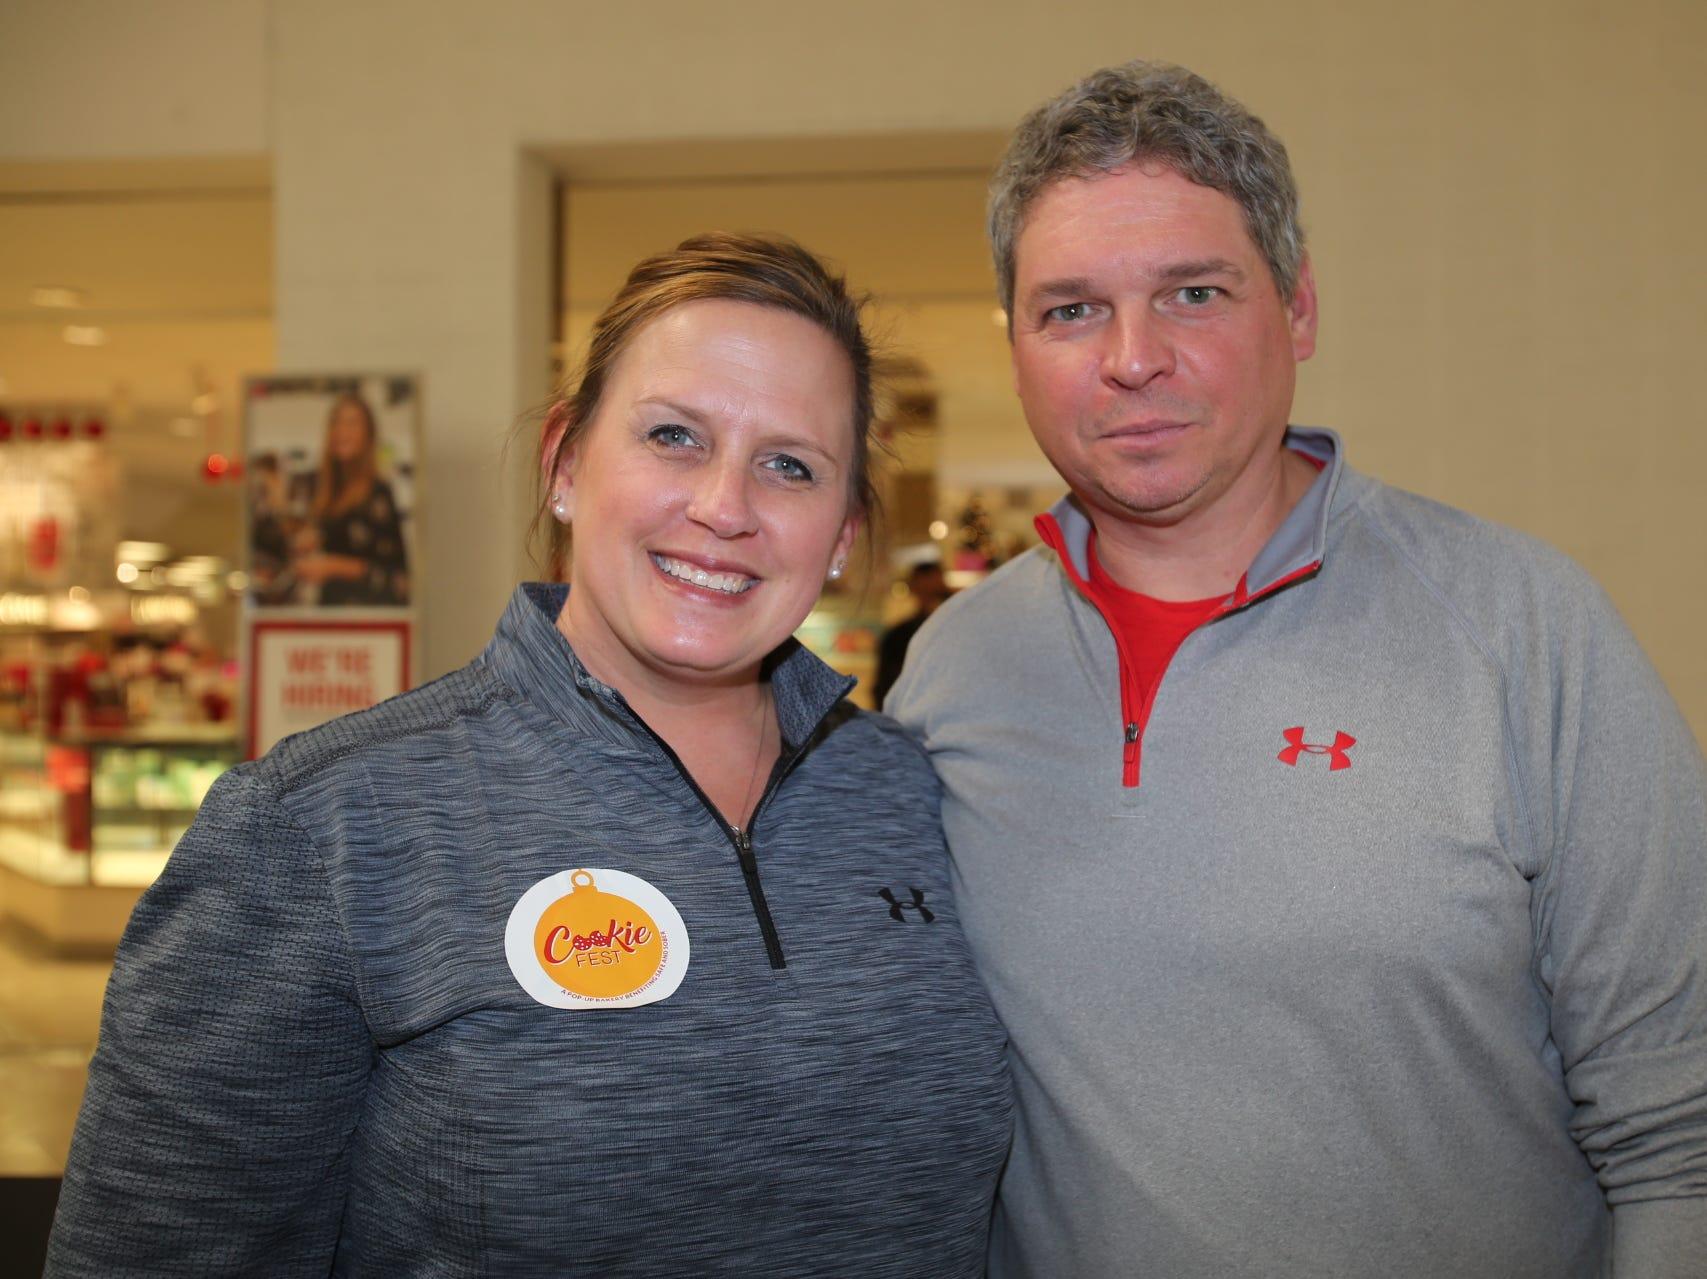 Julie Gray and Steve Peterie